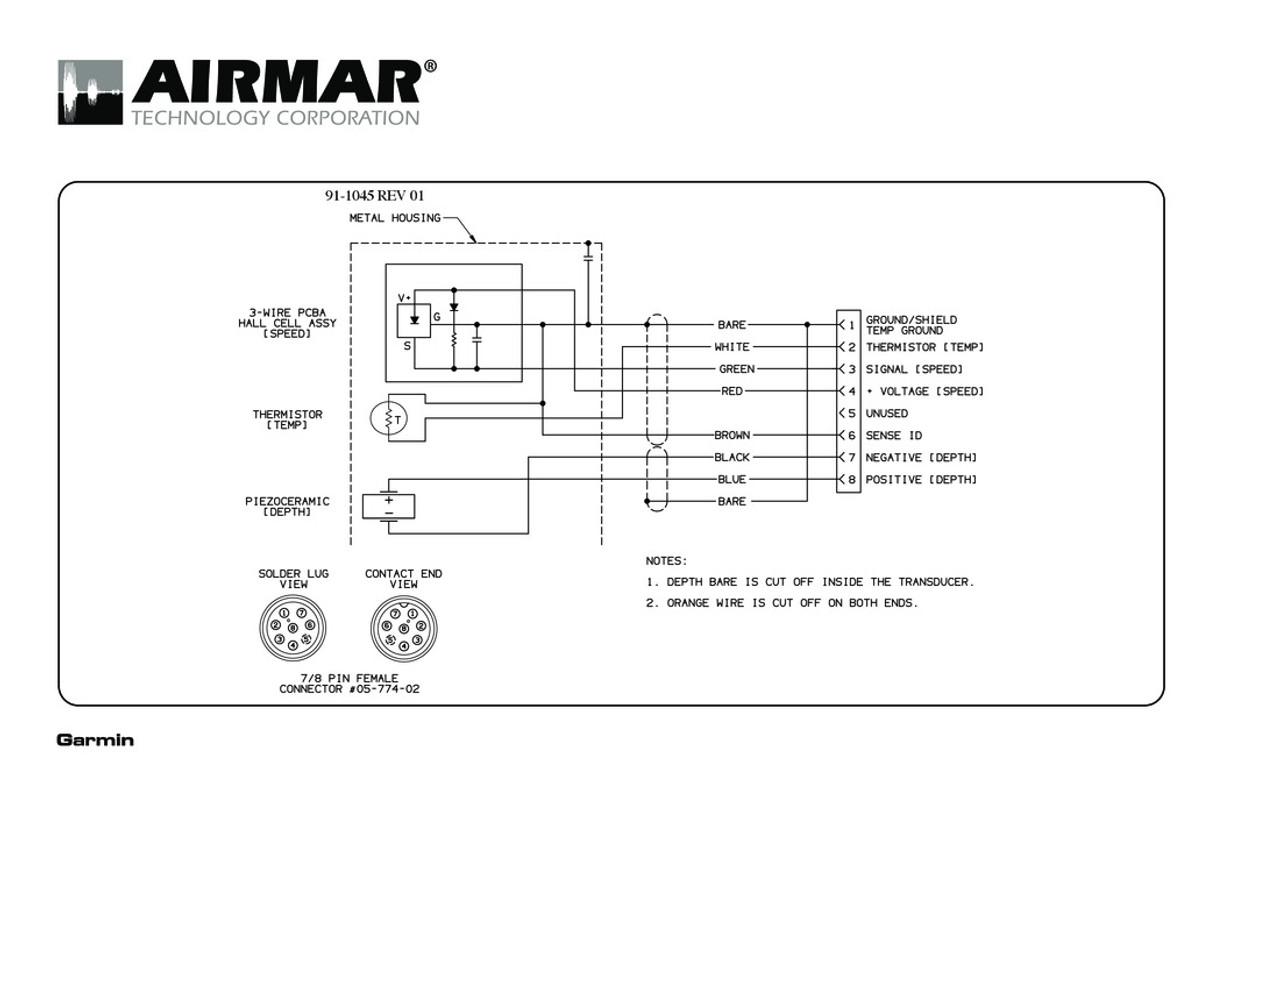 Garmin 2010c Wiring Diagram - Wiring Diagram & Cable Management on